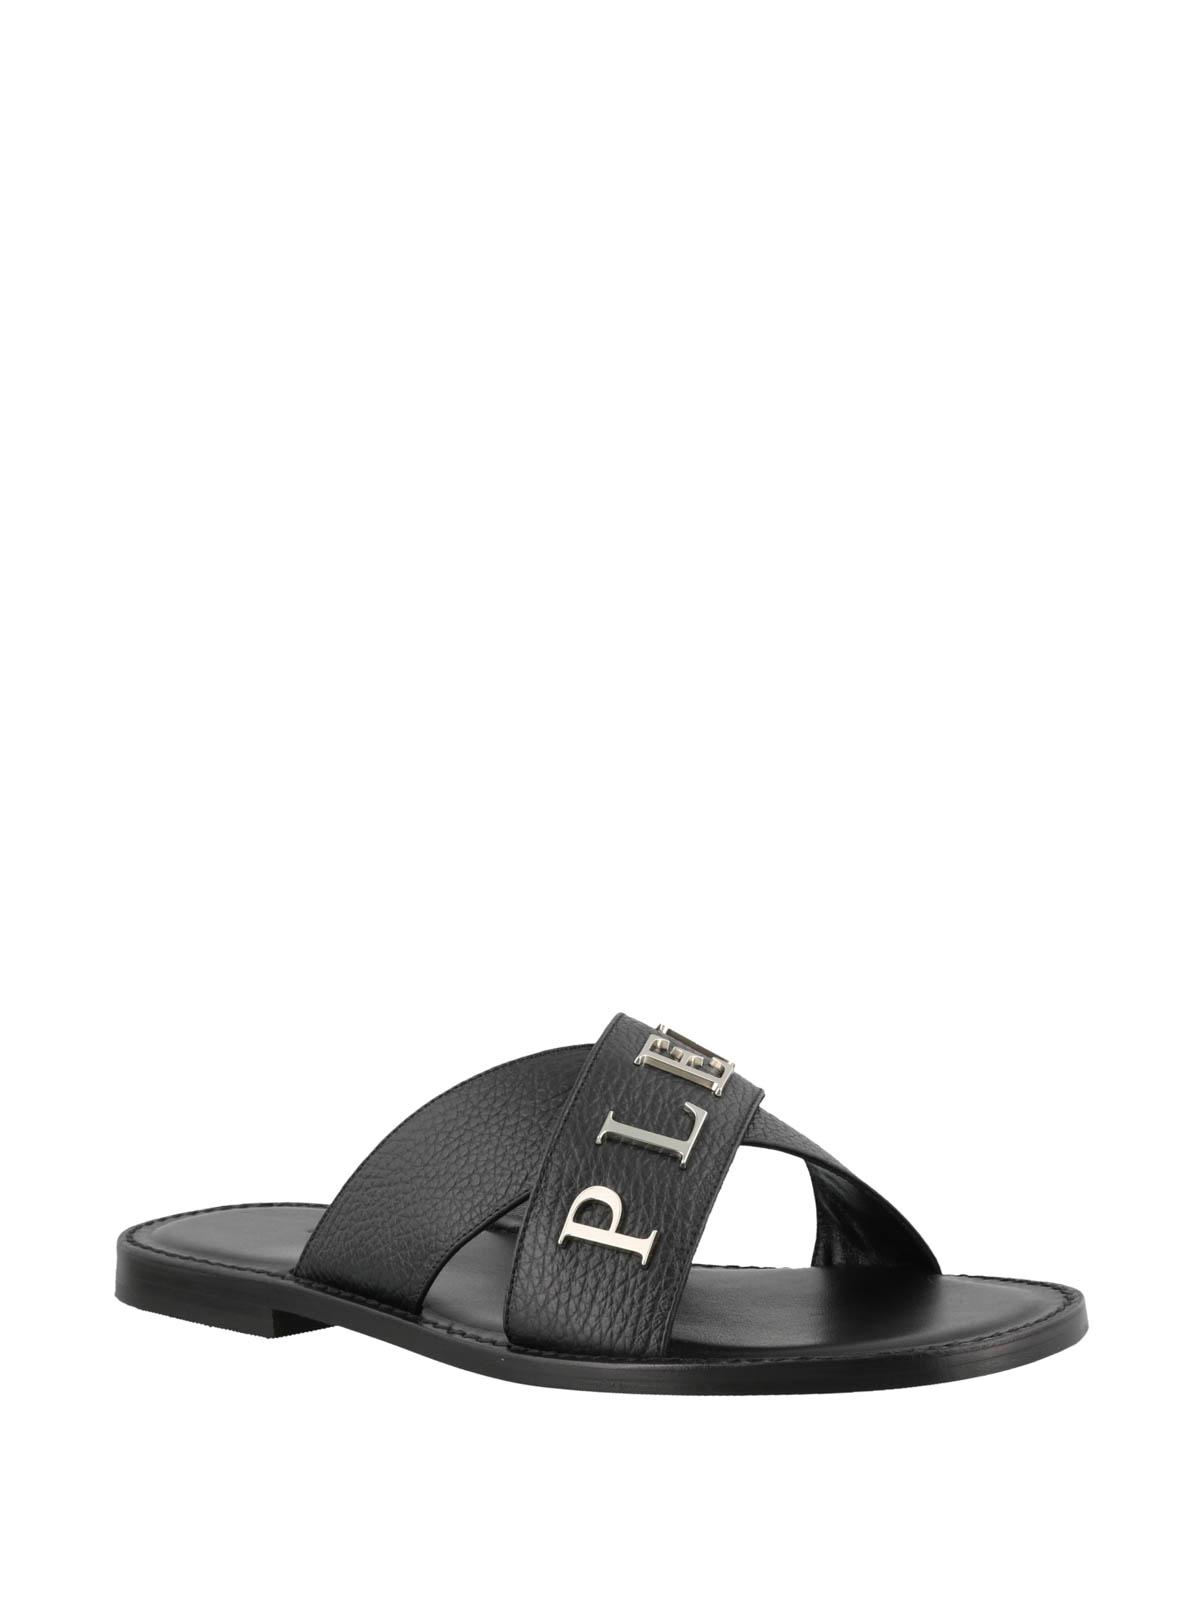 Philipp Flat Leather Sandals Logo Plein Metallic Black doeWrxBQC